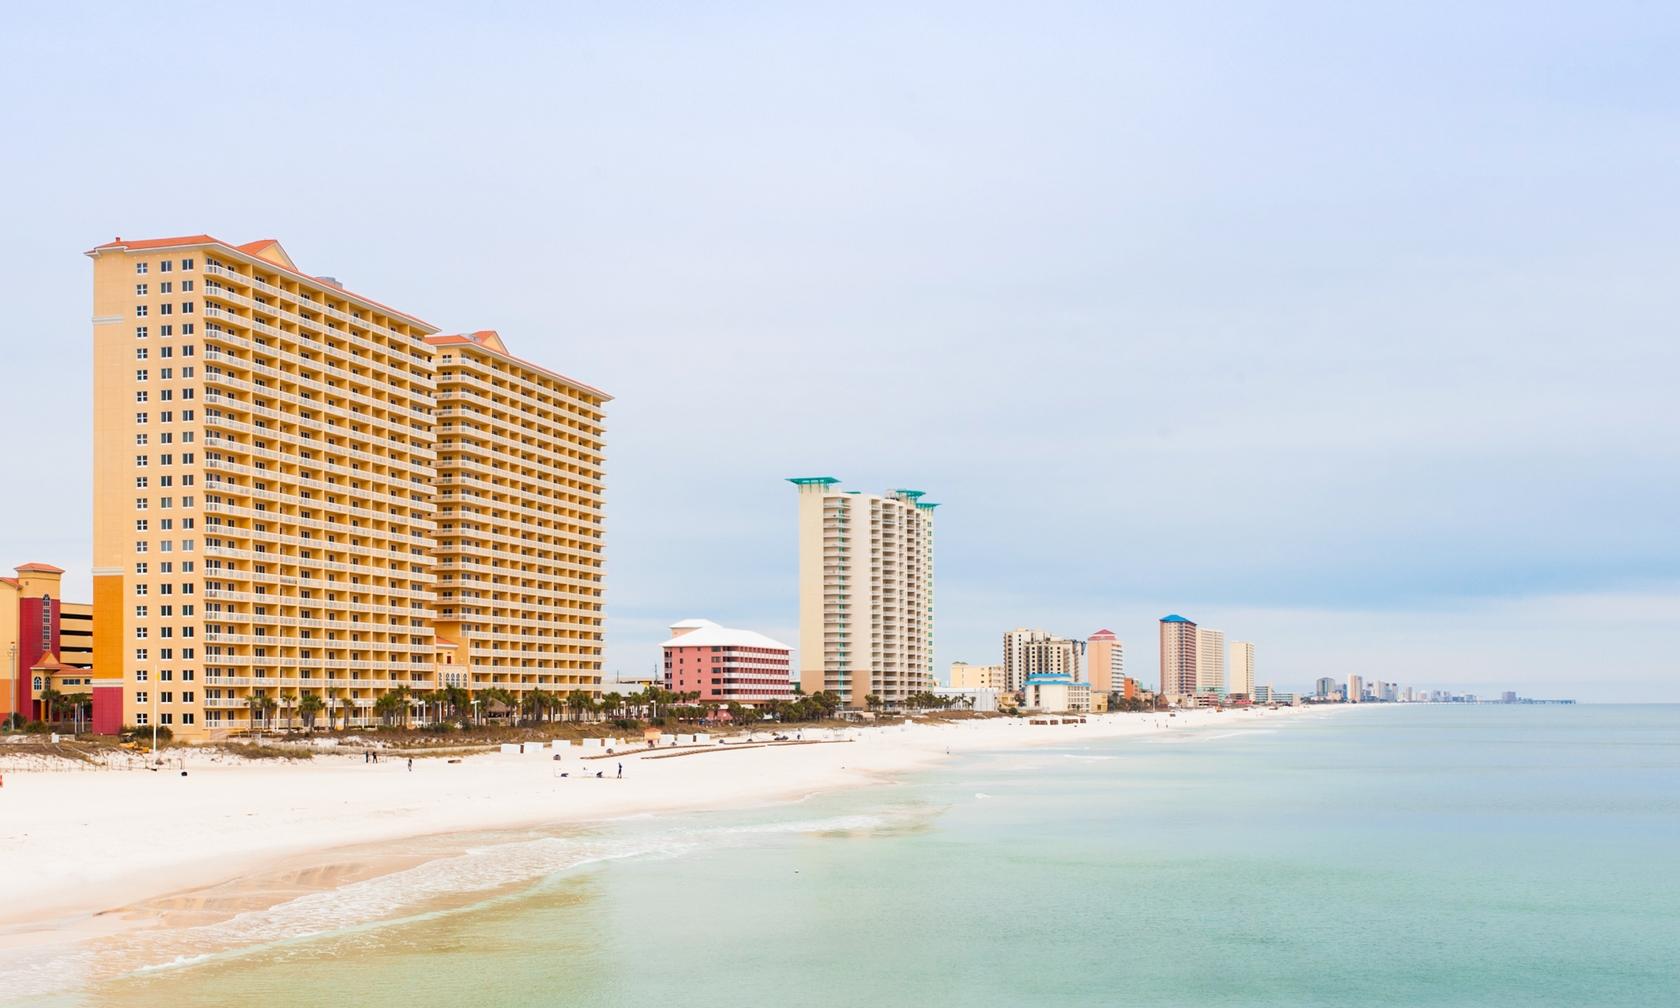 Vacation rental beach condos in Panama City Beach